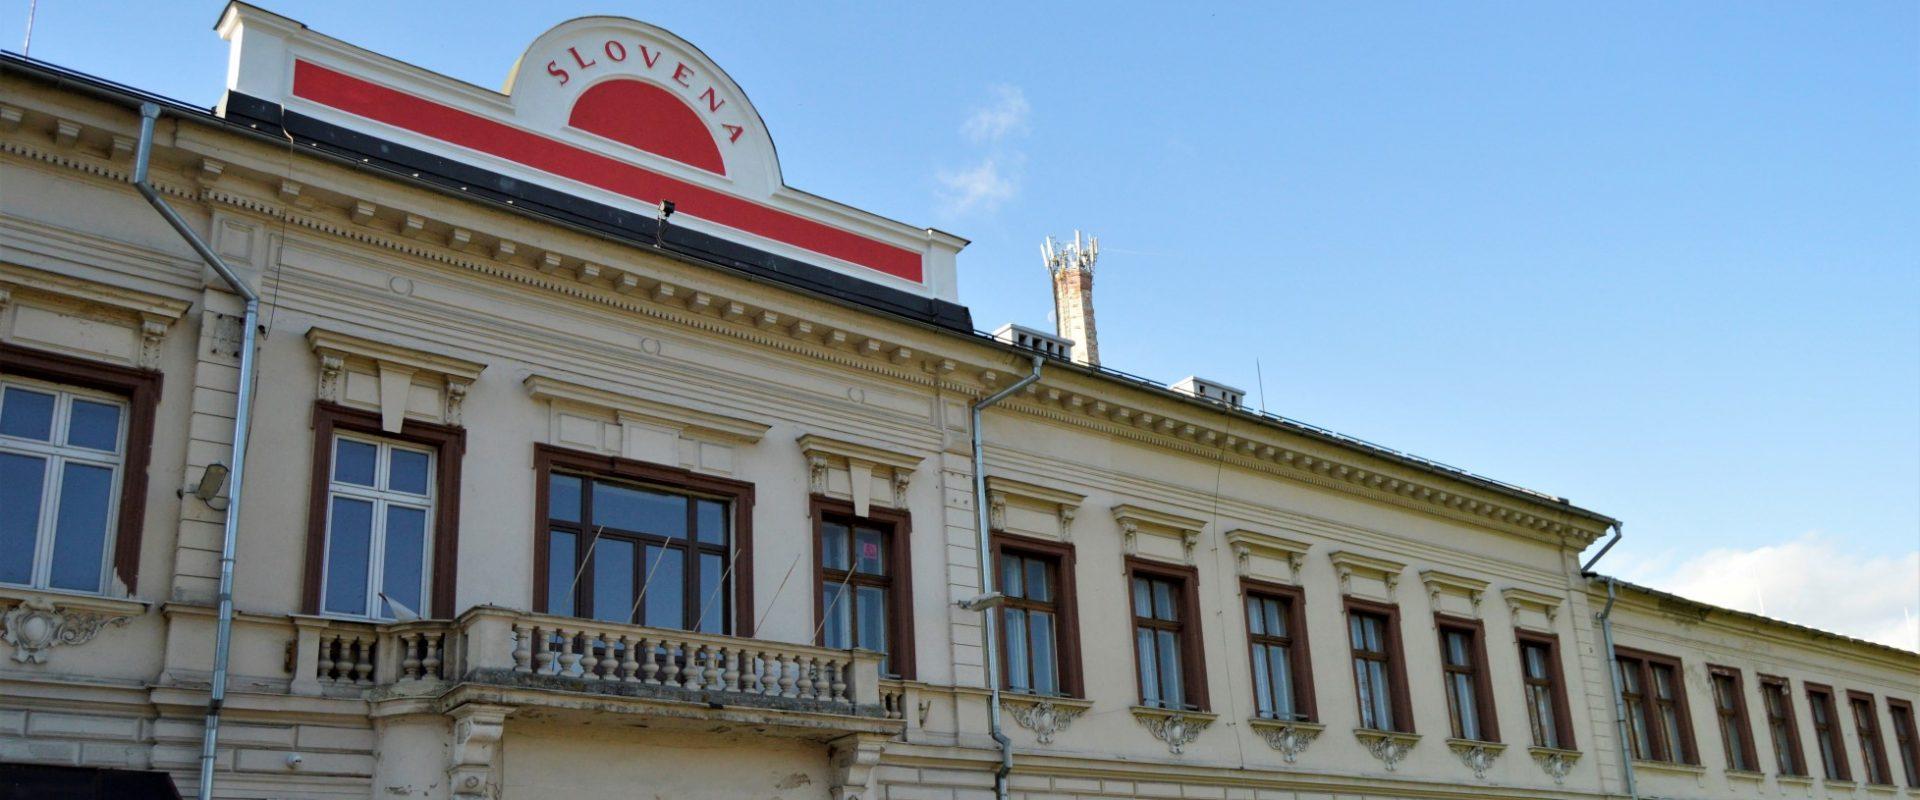 Slovena a.s.